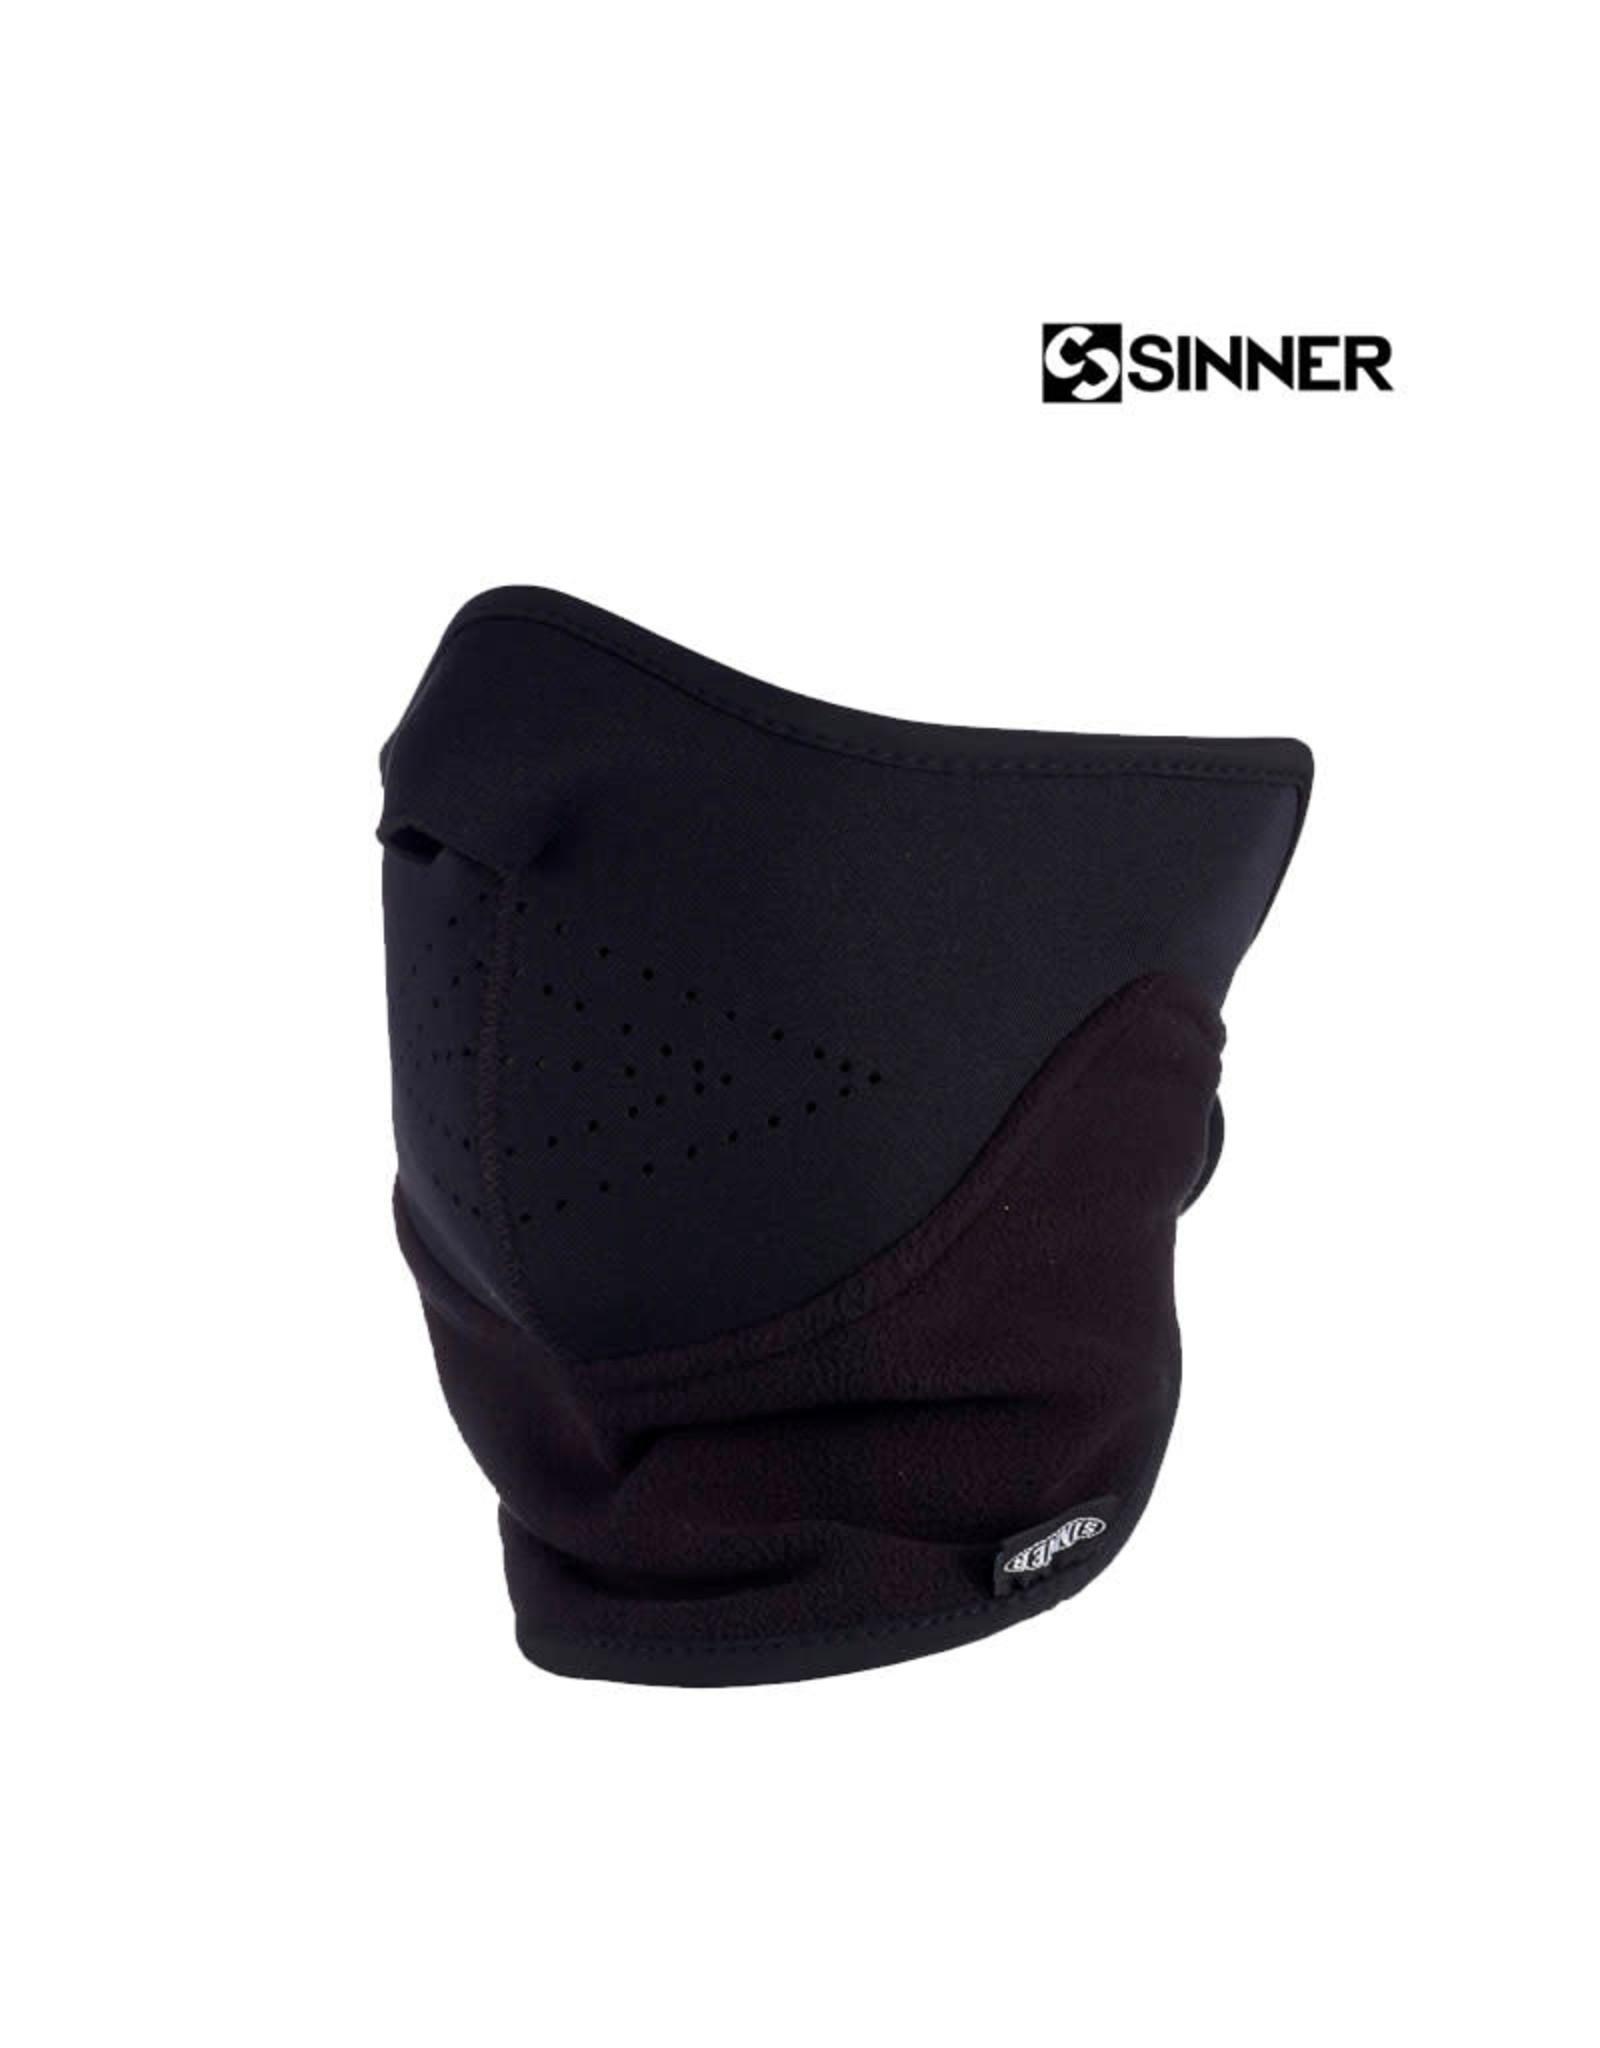 SINNER Face Mask Black Sz Uni